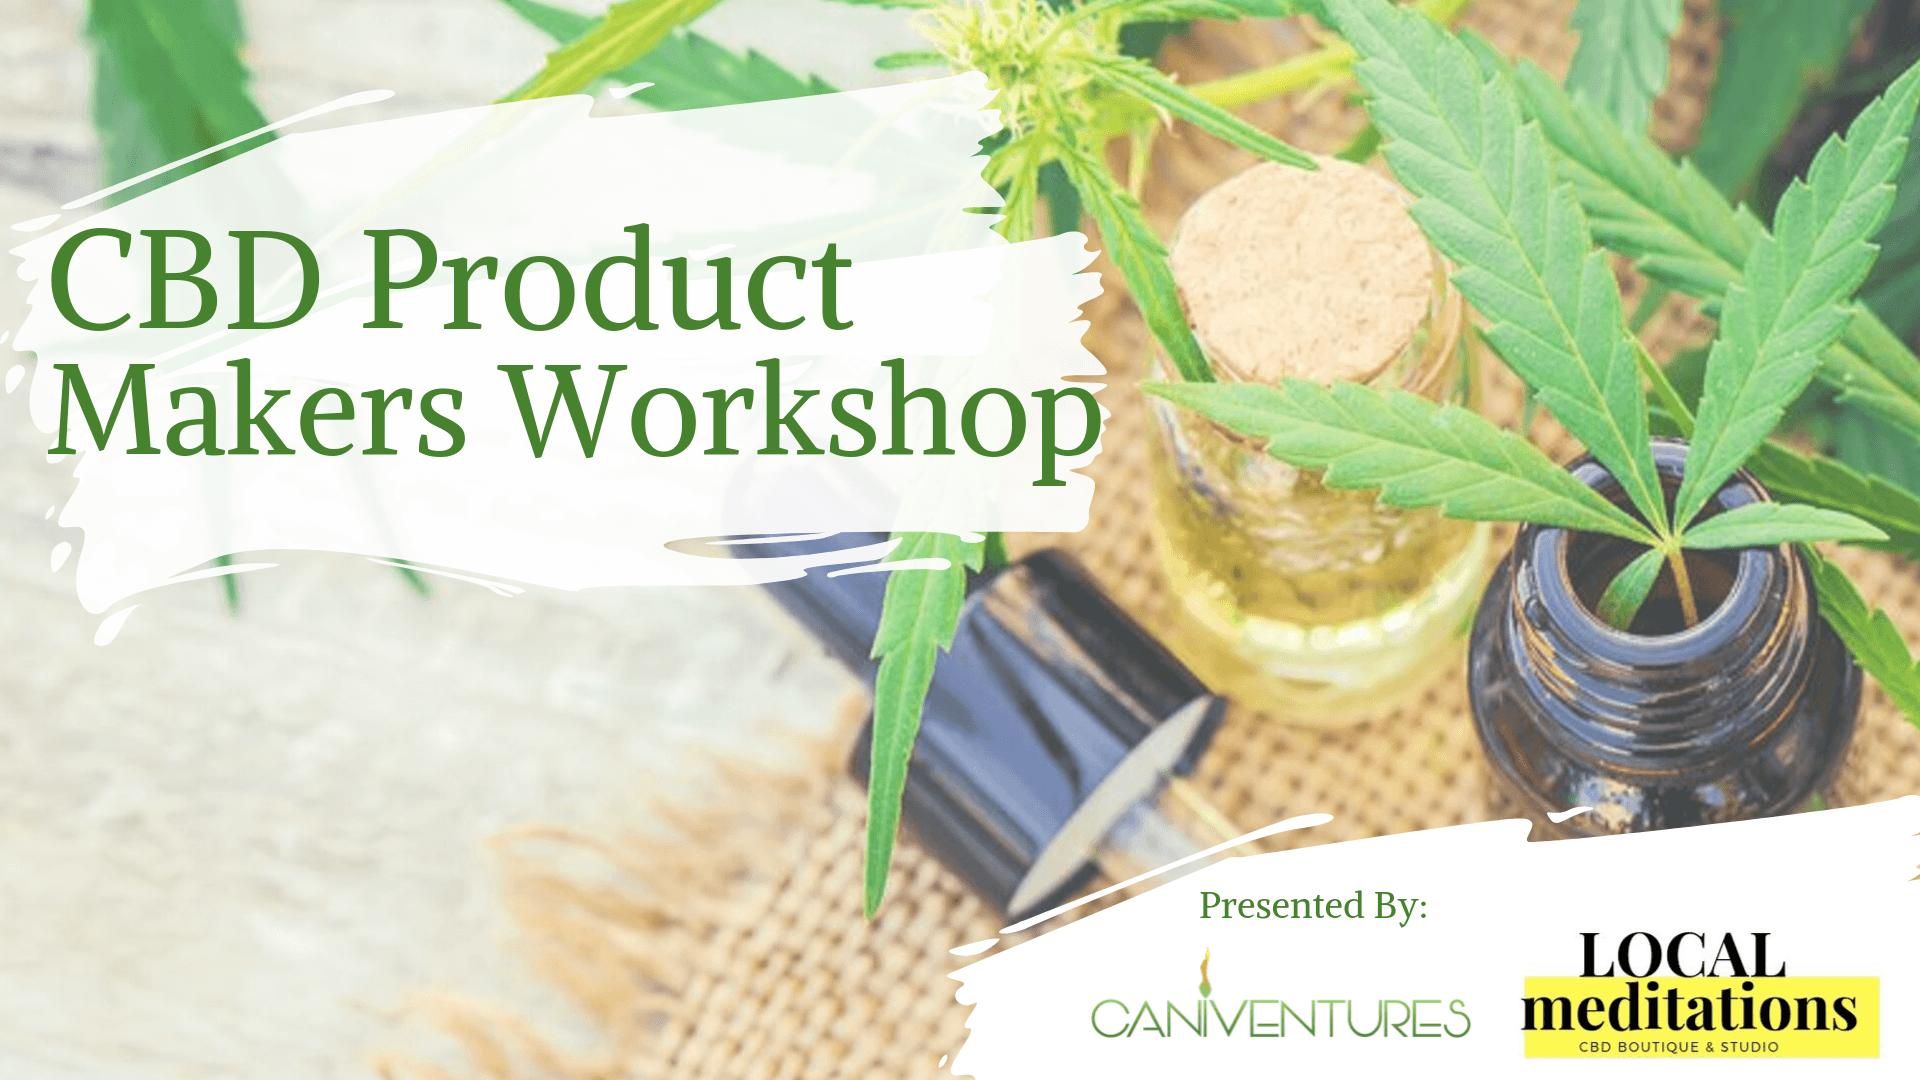 CBD Product Makers Workshop